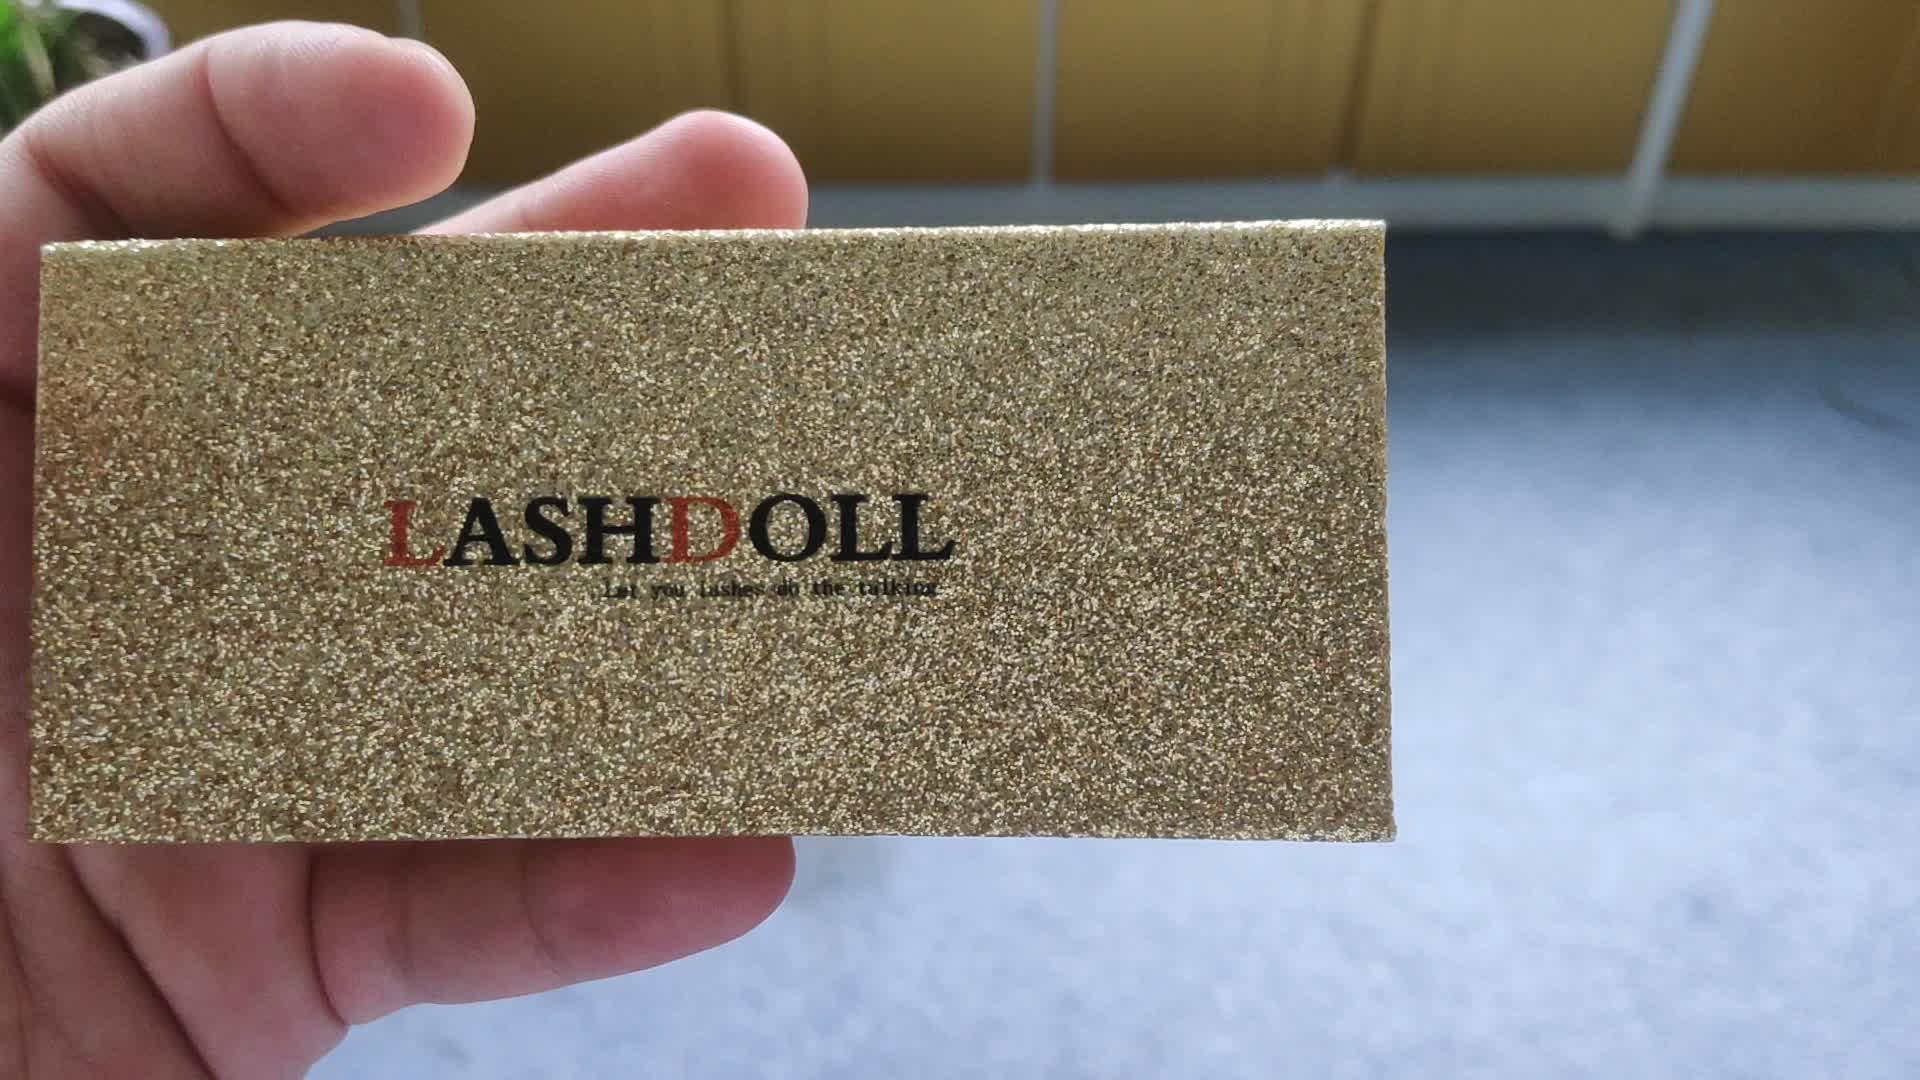 High quality fast delivery spot eyelash box magnetic box